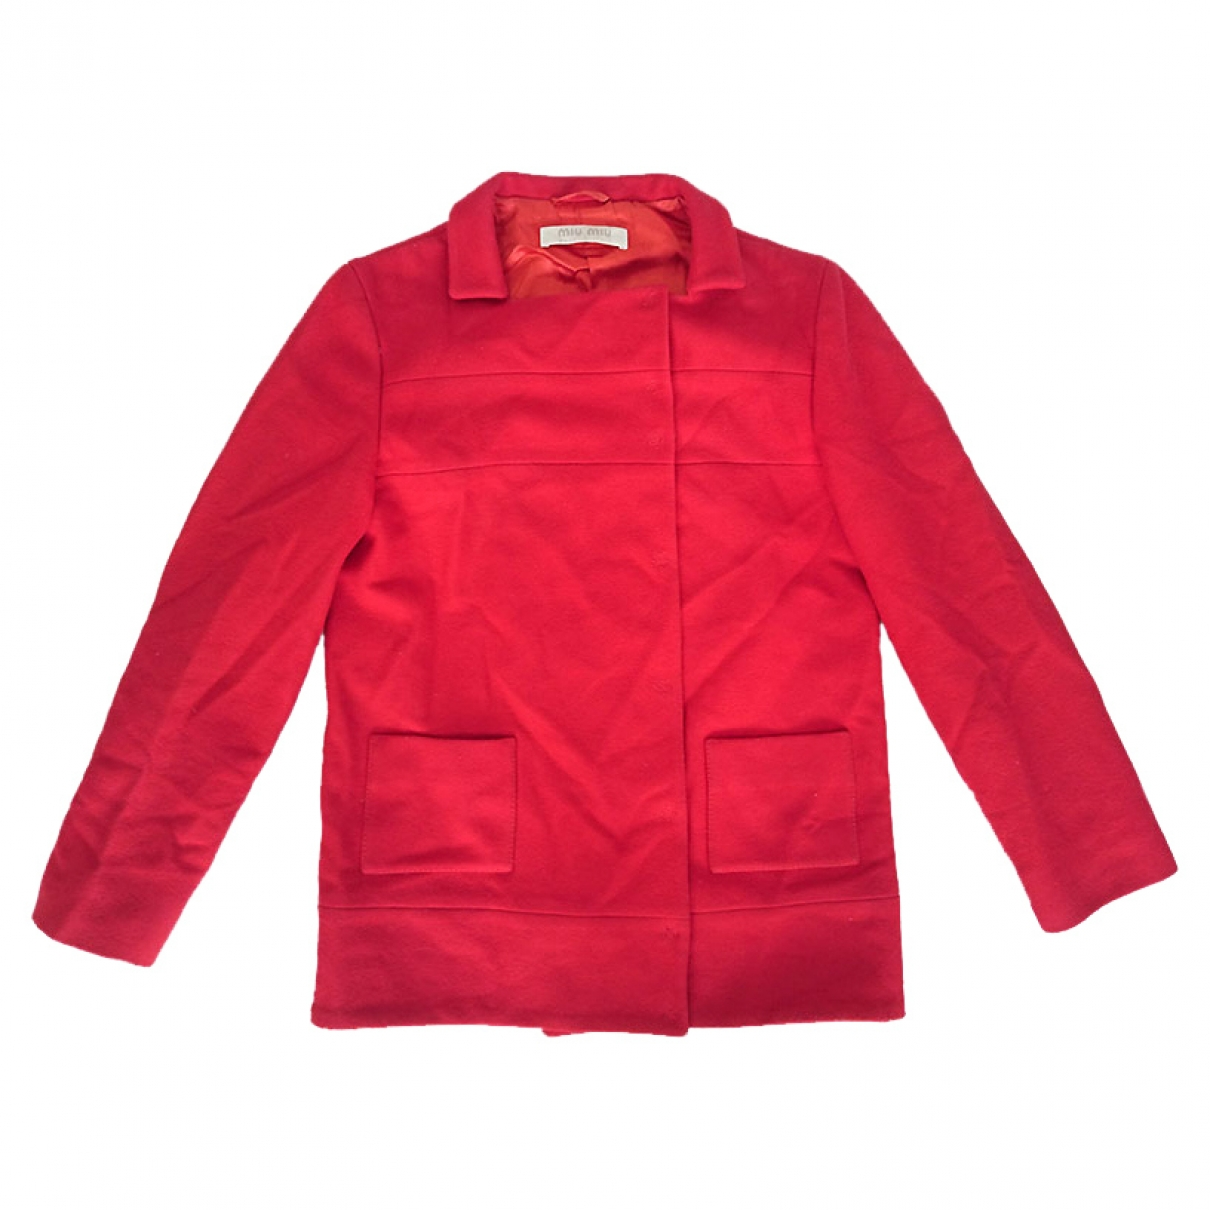 Miu Miu \N Red Wool jacket for Women 40 IT